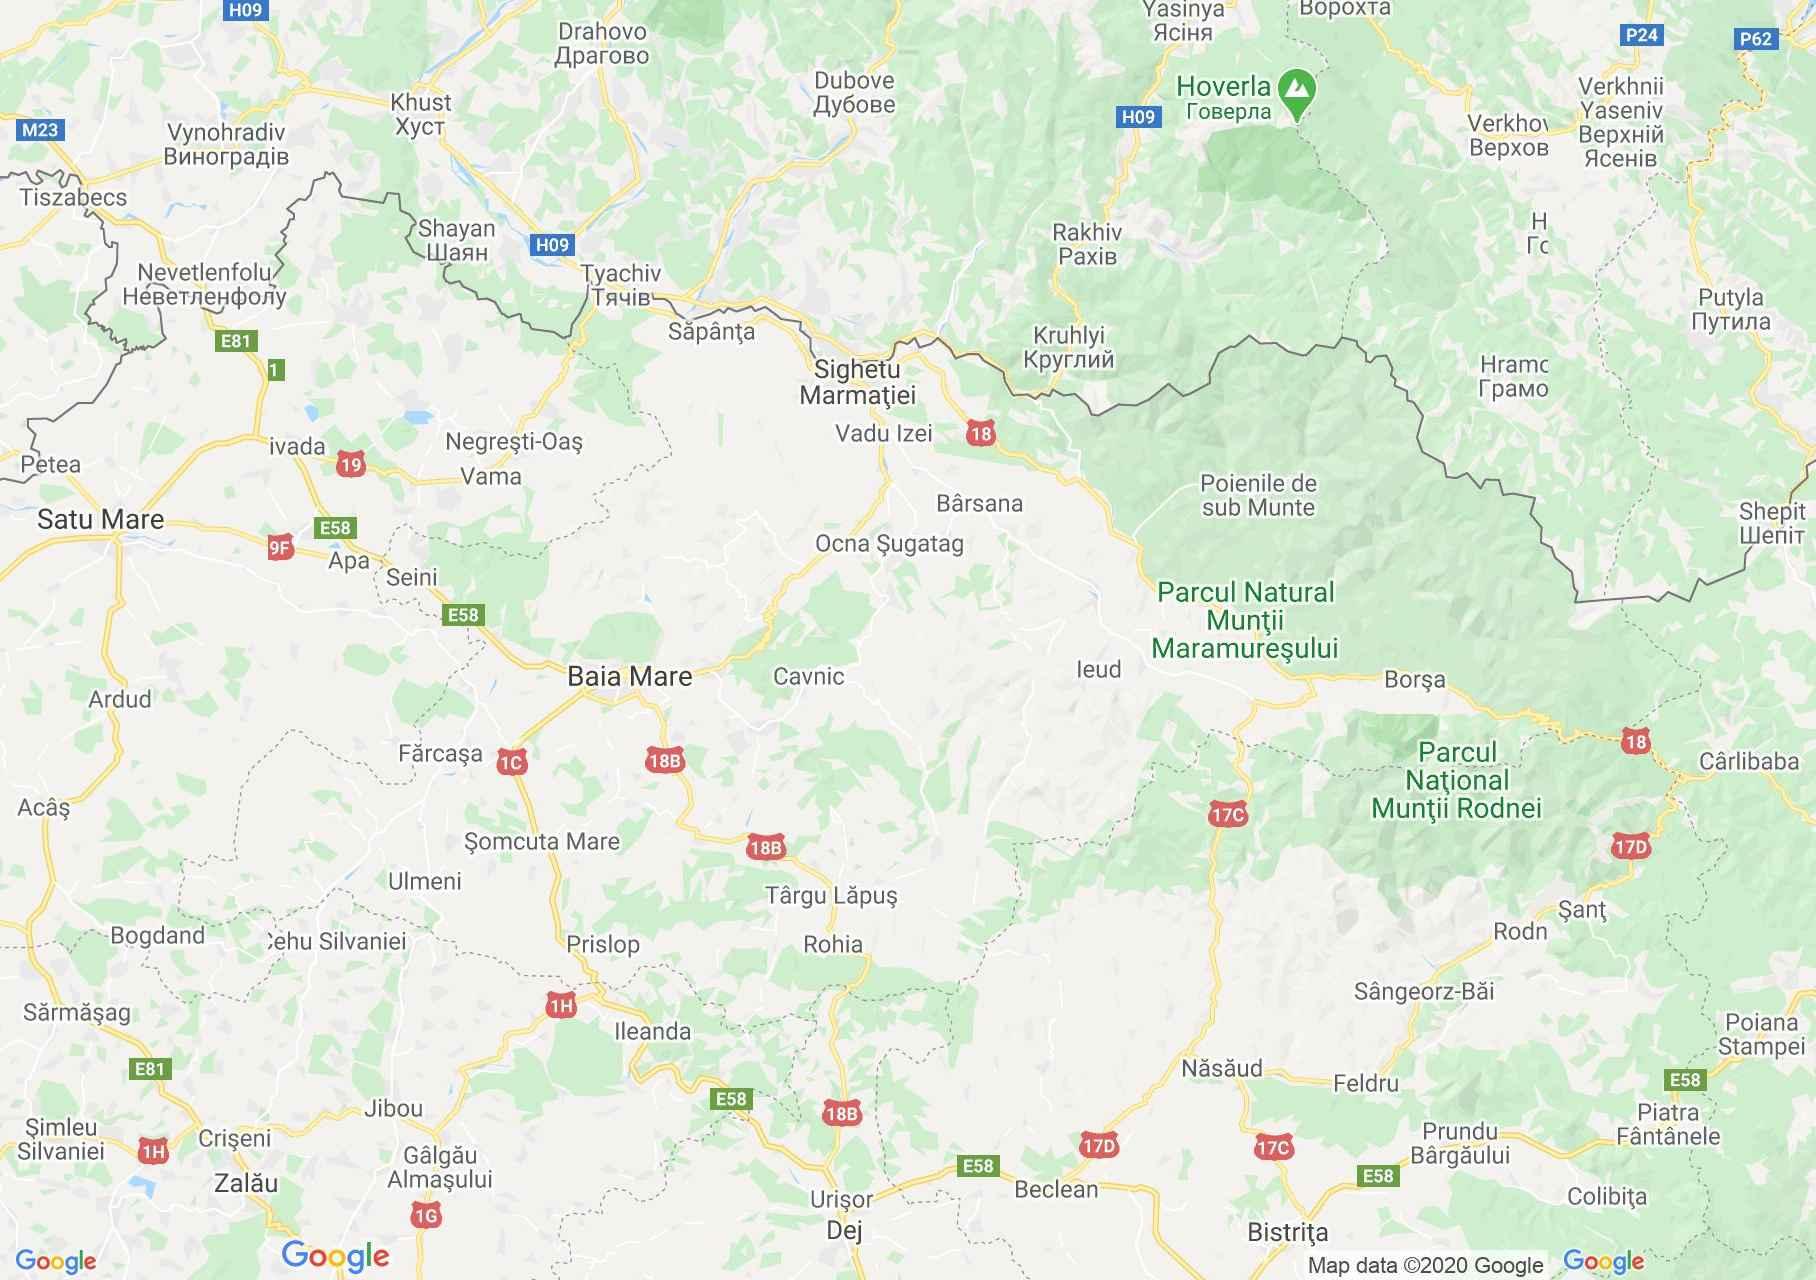 Maramureş county: (Baia Mare), Interactive tourist map